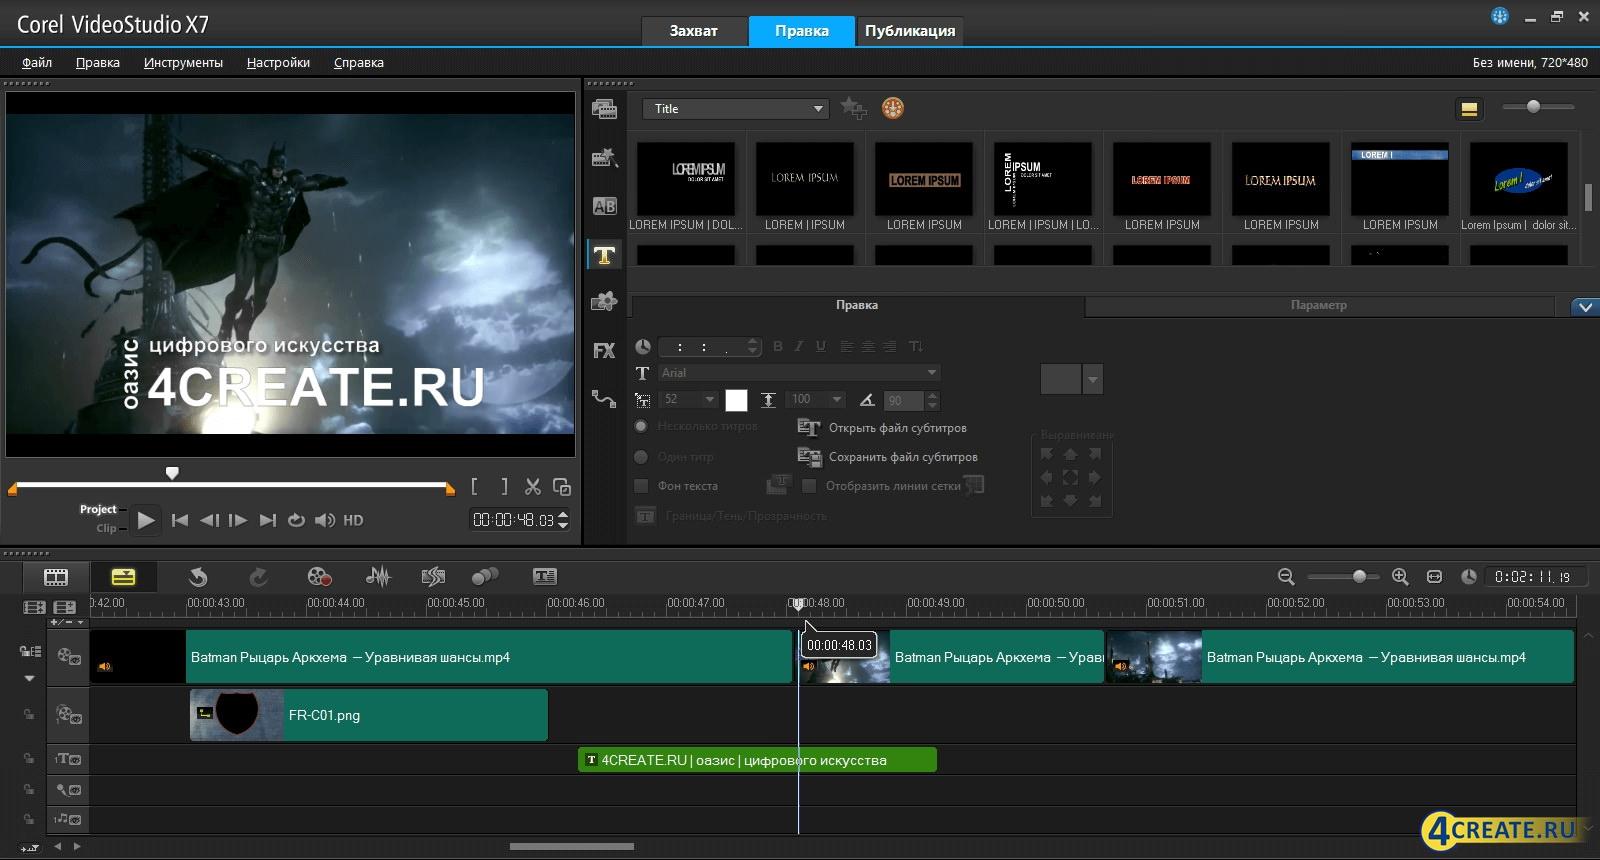 Corel VideoStudio Pro X9 (Скриншот 4)